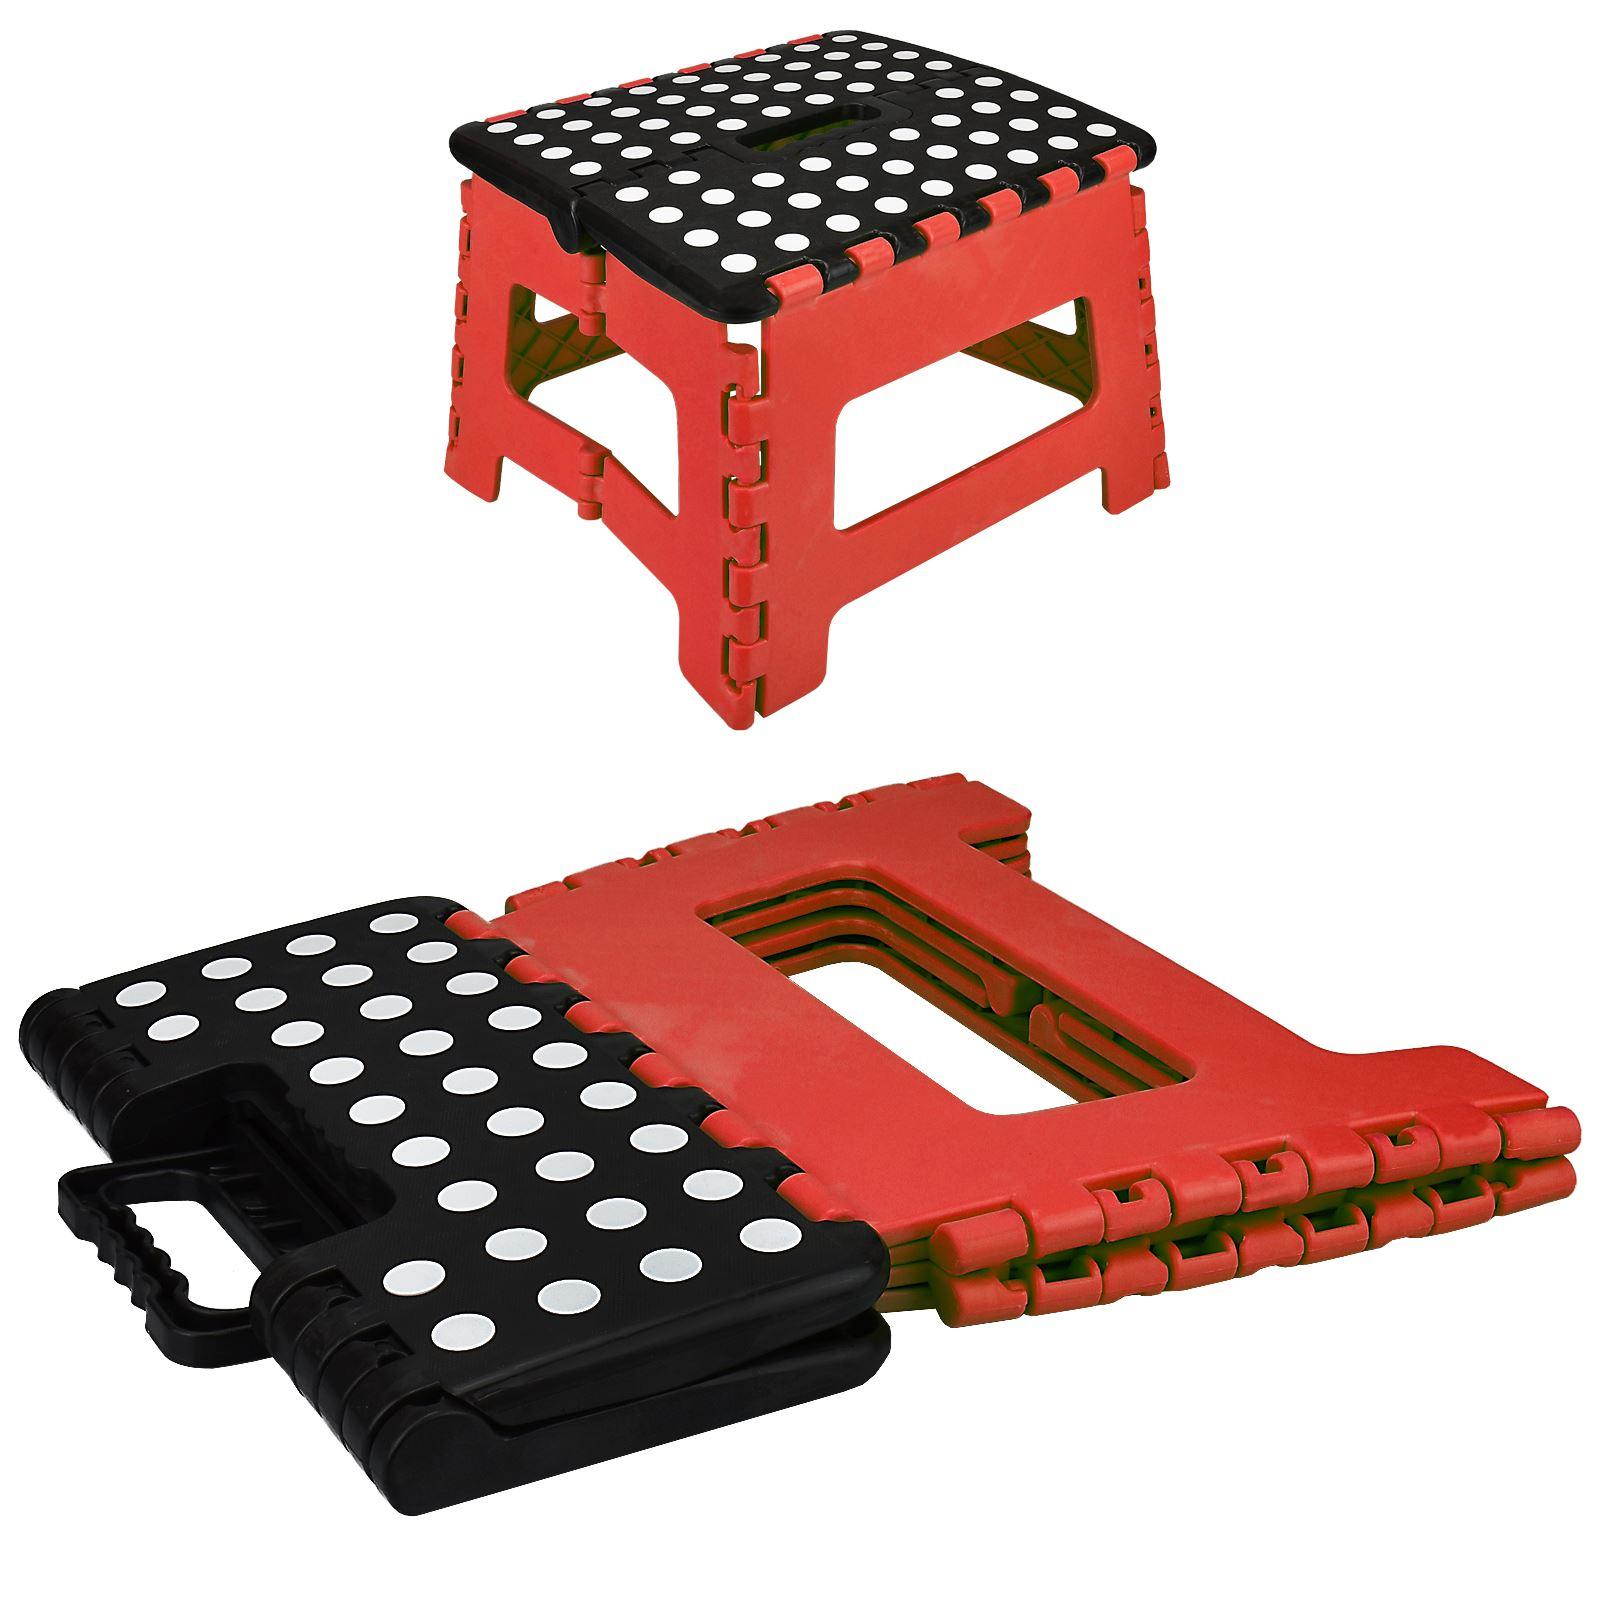 Large multi purpose fold step stool plastic home kitchen foldable easy storage ebay - Escabeau de cuisine pliable ...